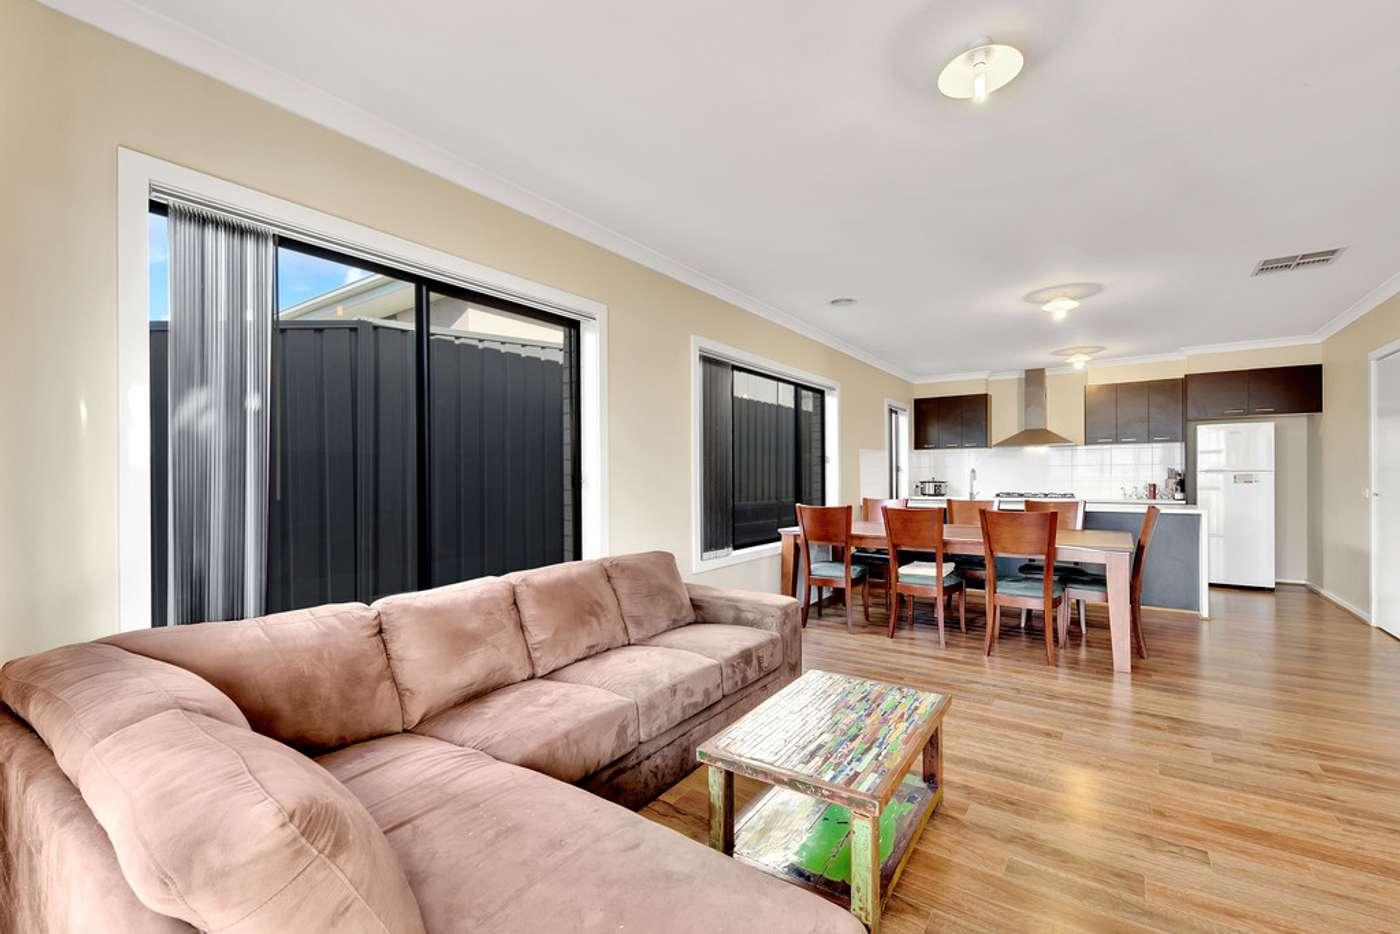 Main view of Homely house listing, 9 McAuliffe Street, Wodonga VIC 3690